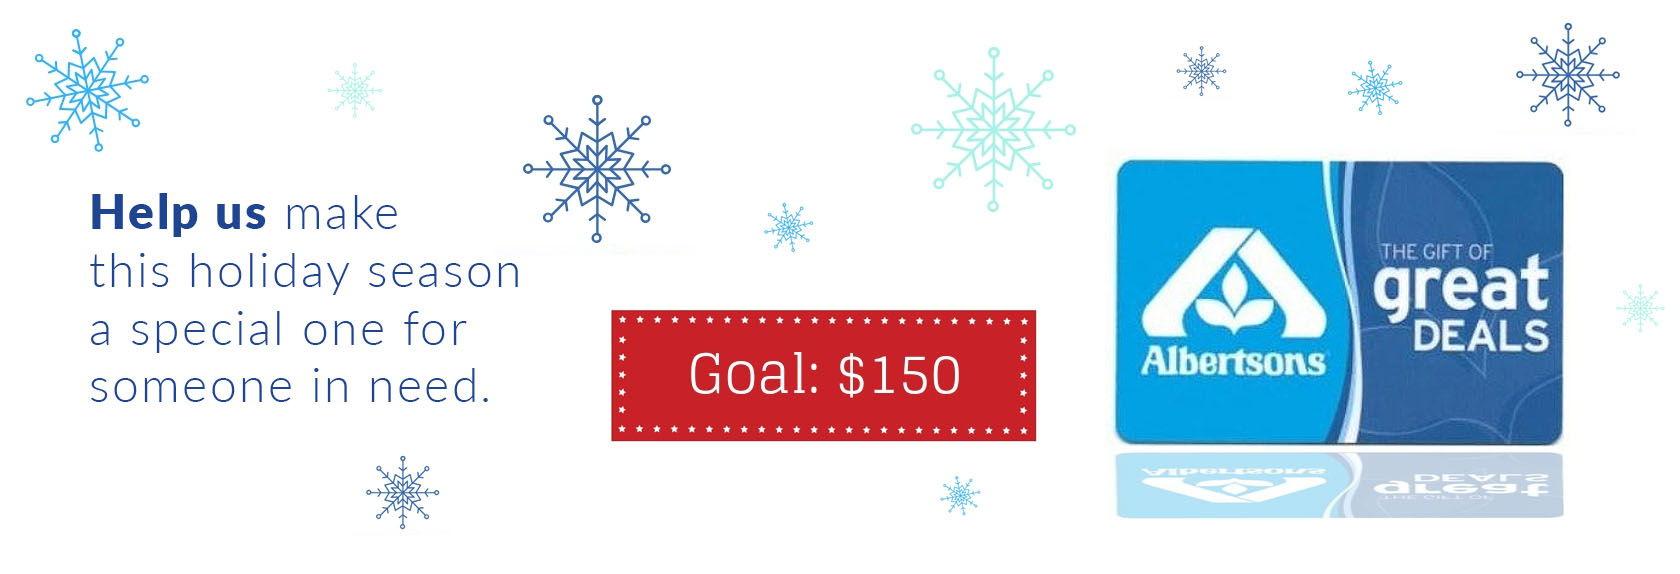 Help us make this holiday season special